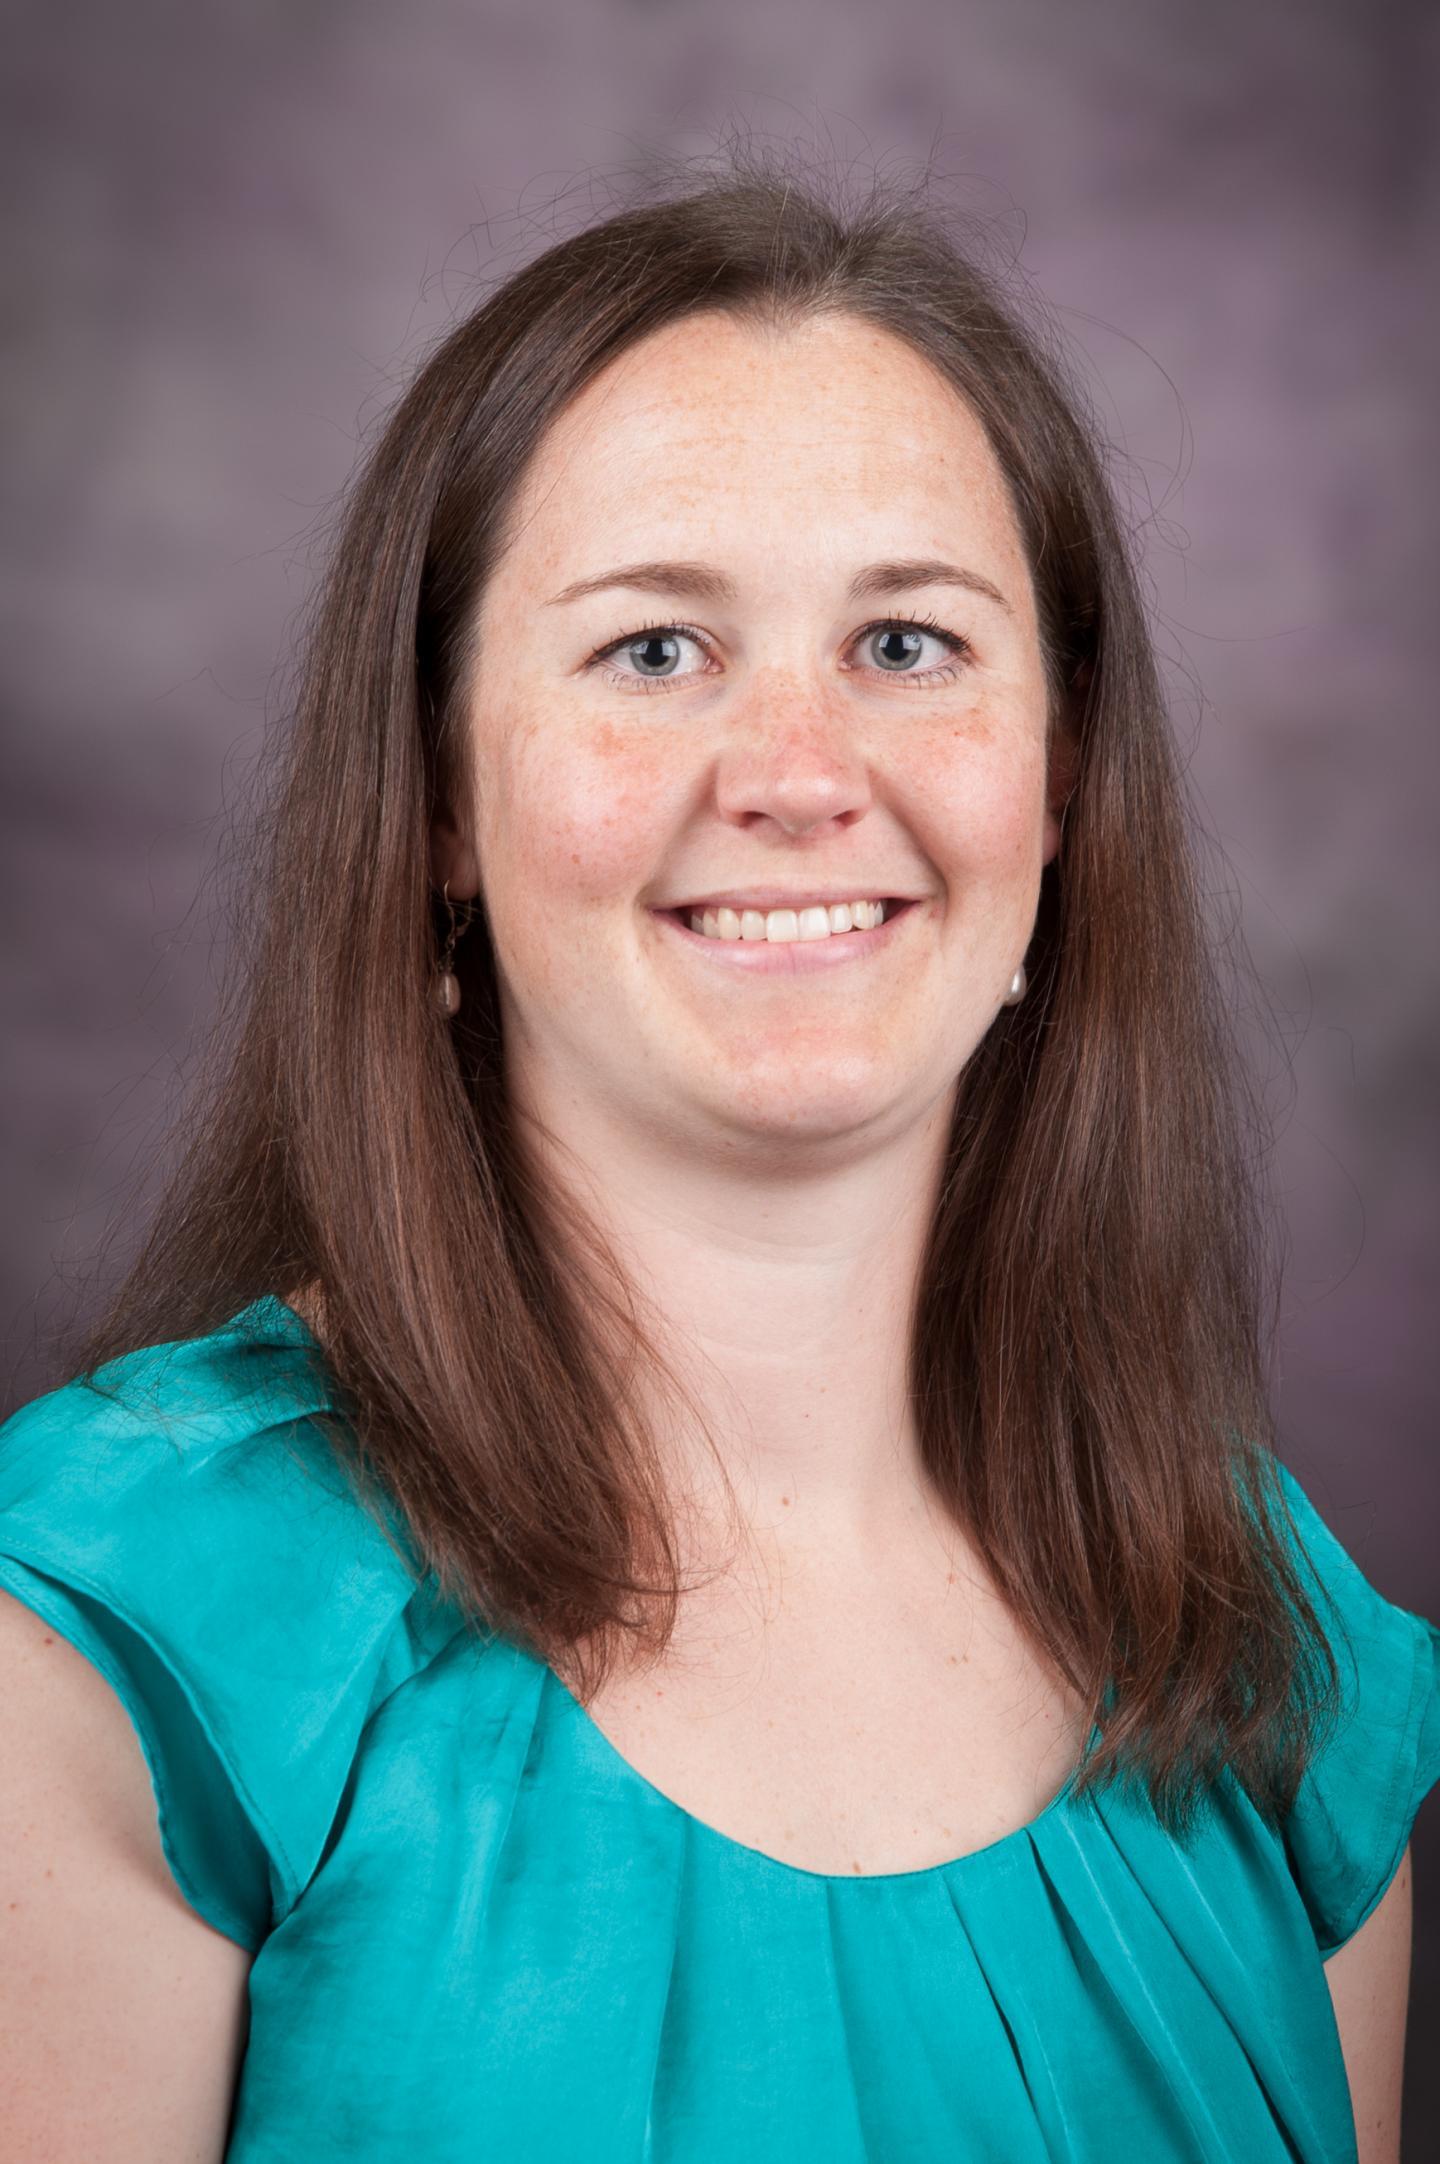 Emily Mailey, Kansas State University